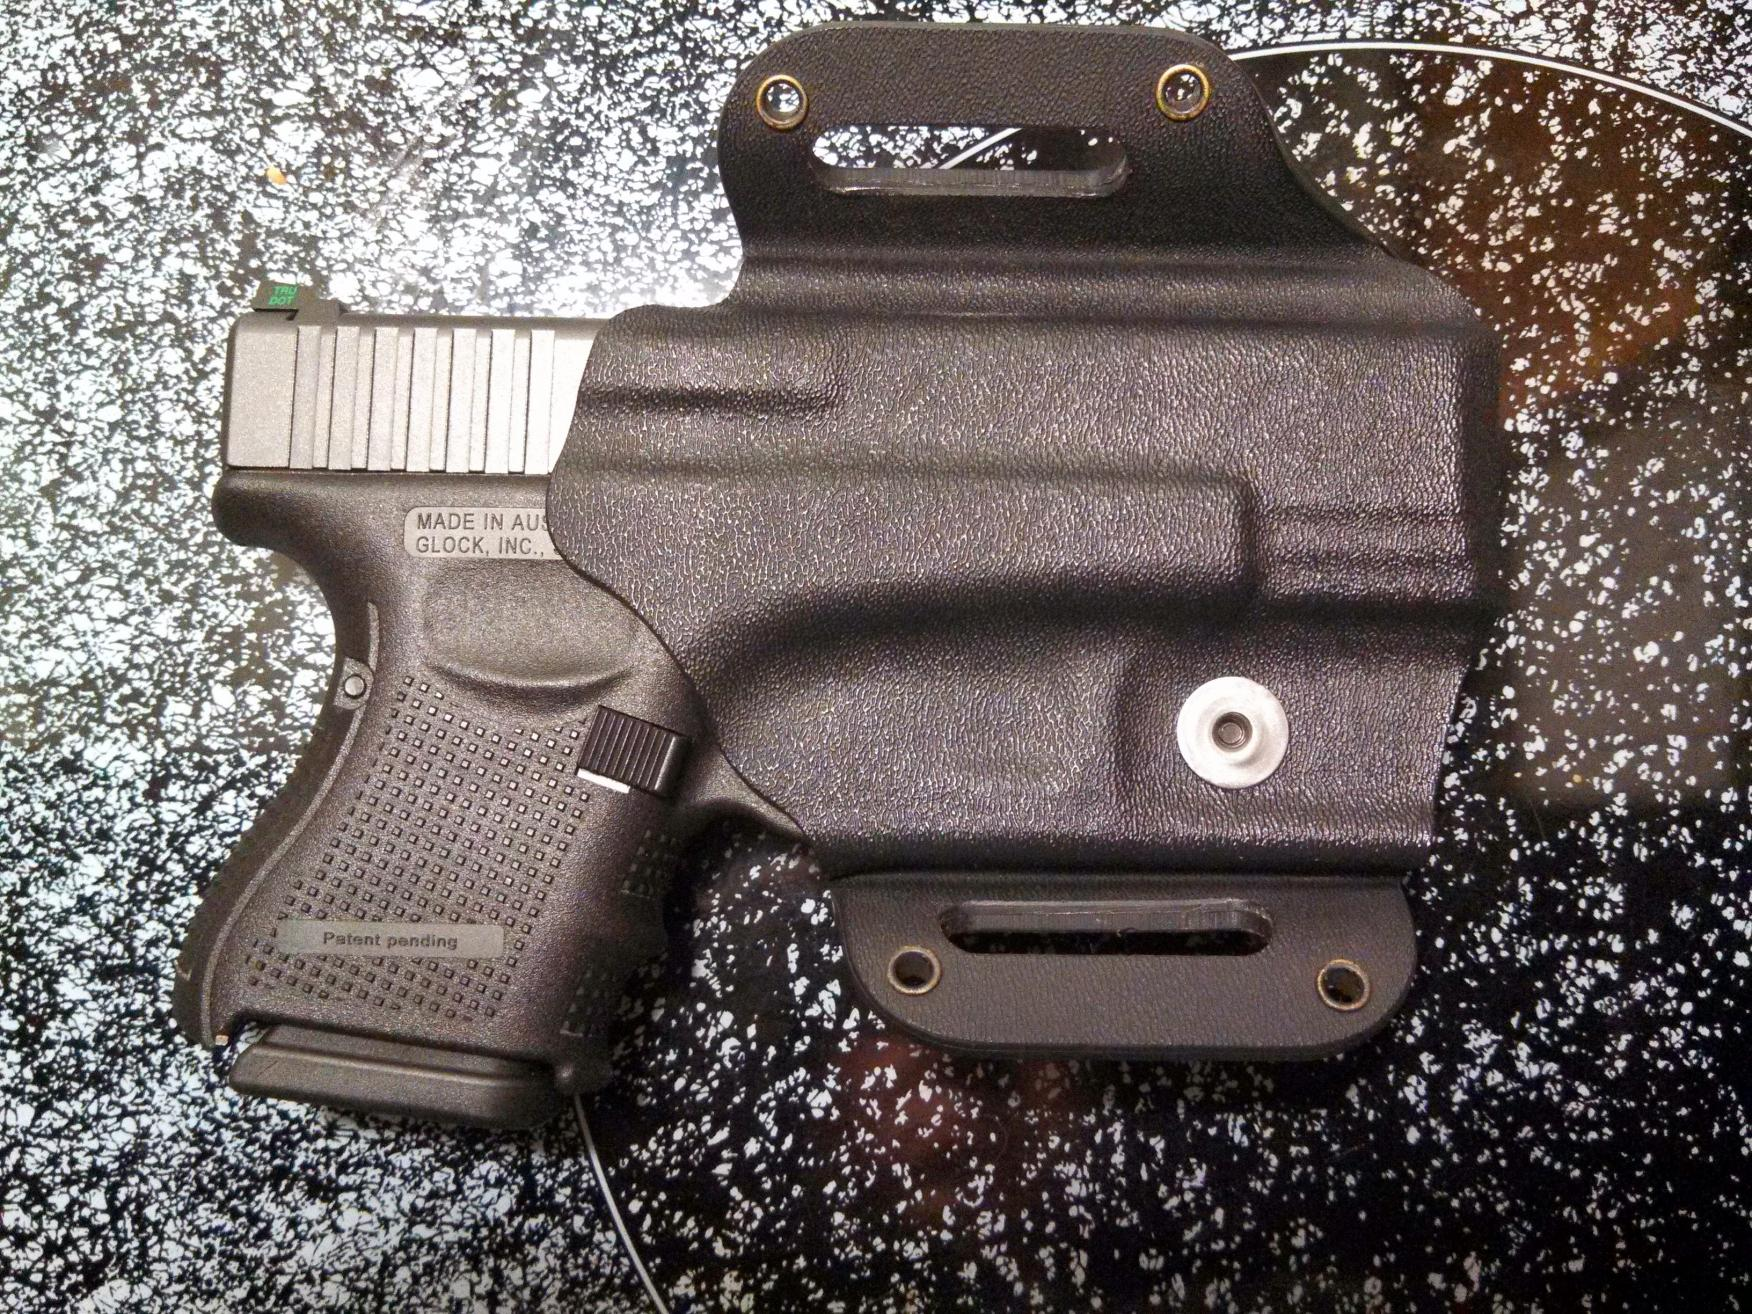 X-Concealment Glock Holster-img_20140121_231438_139.jpg